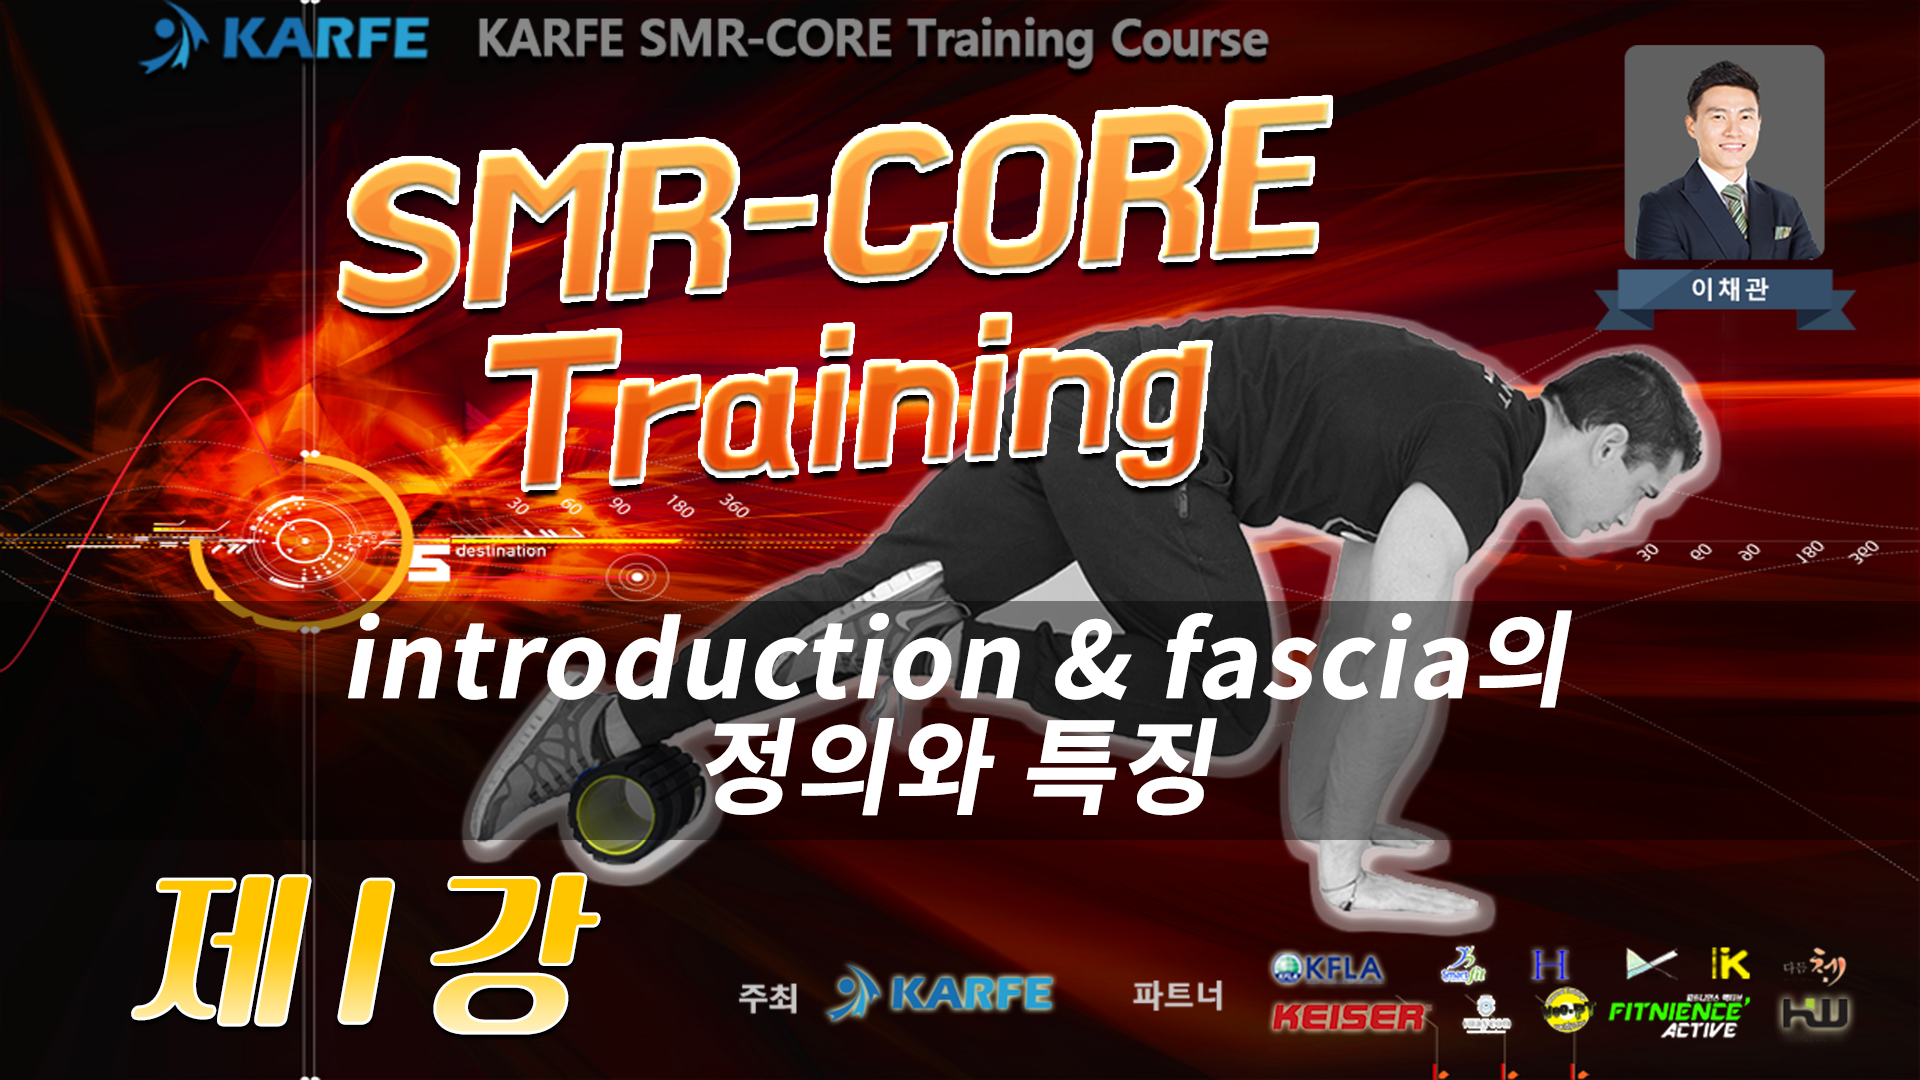 SMR-CORE Training Course